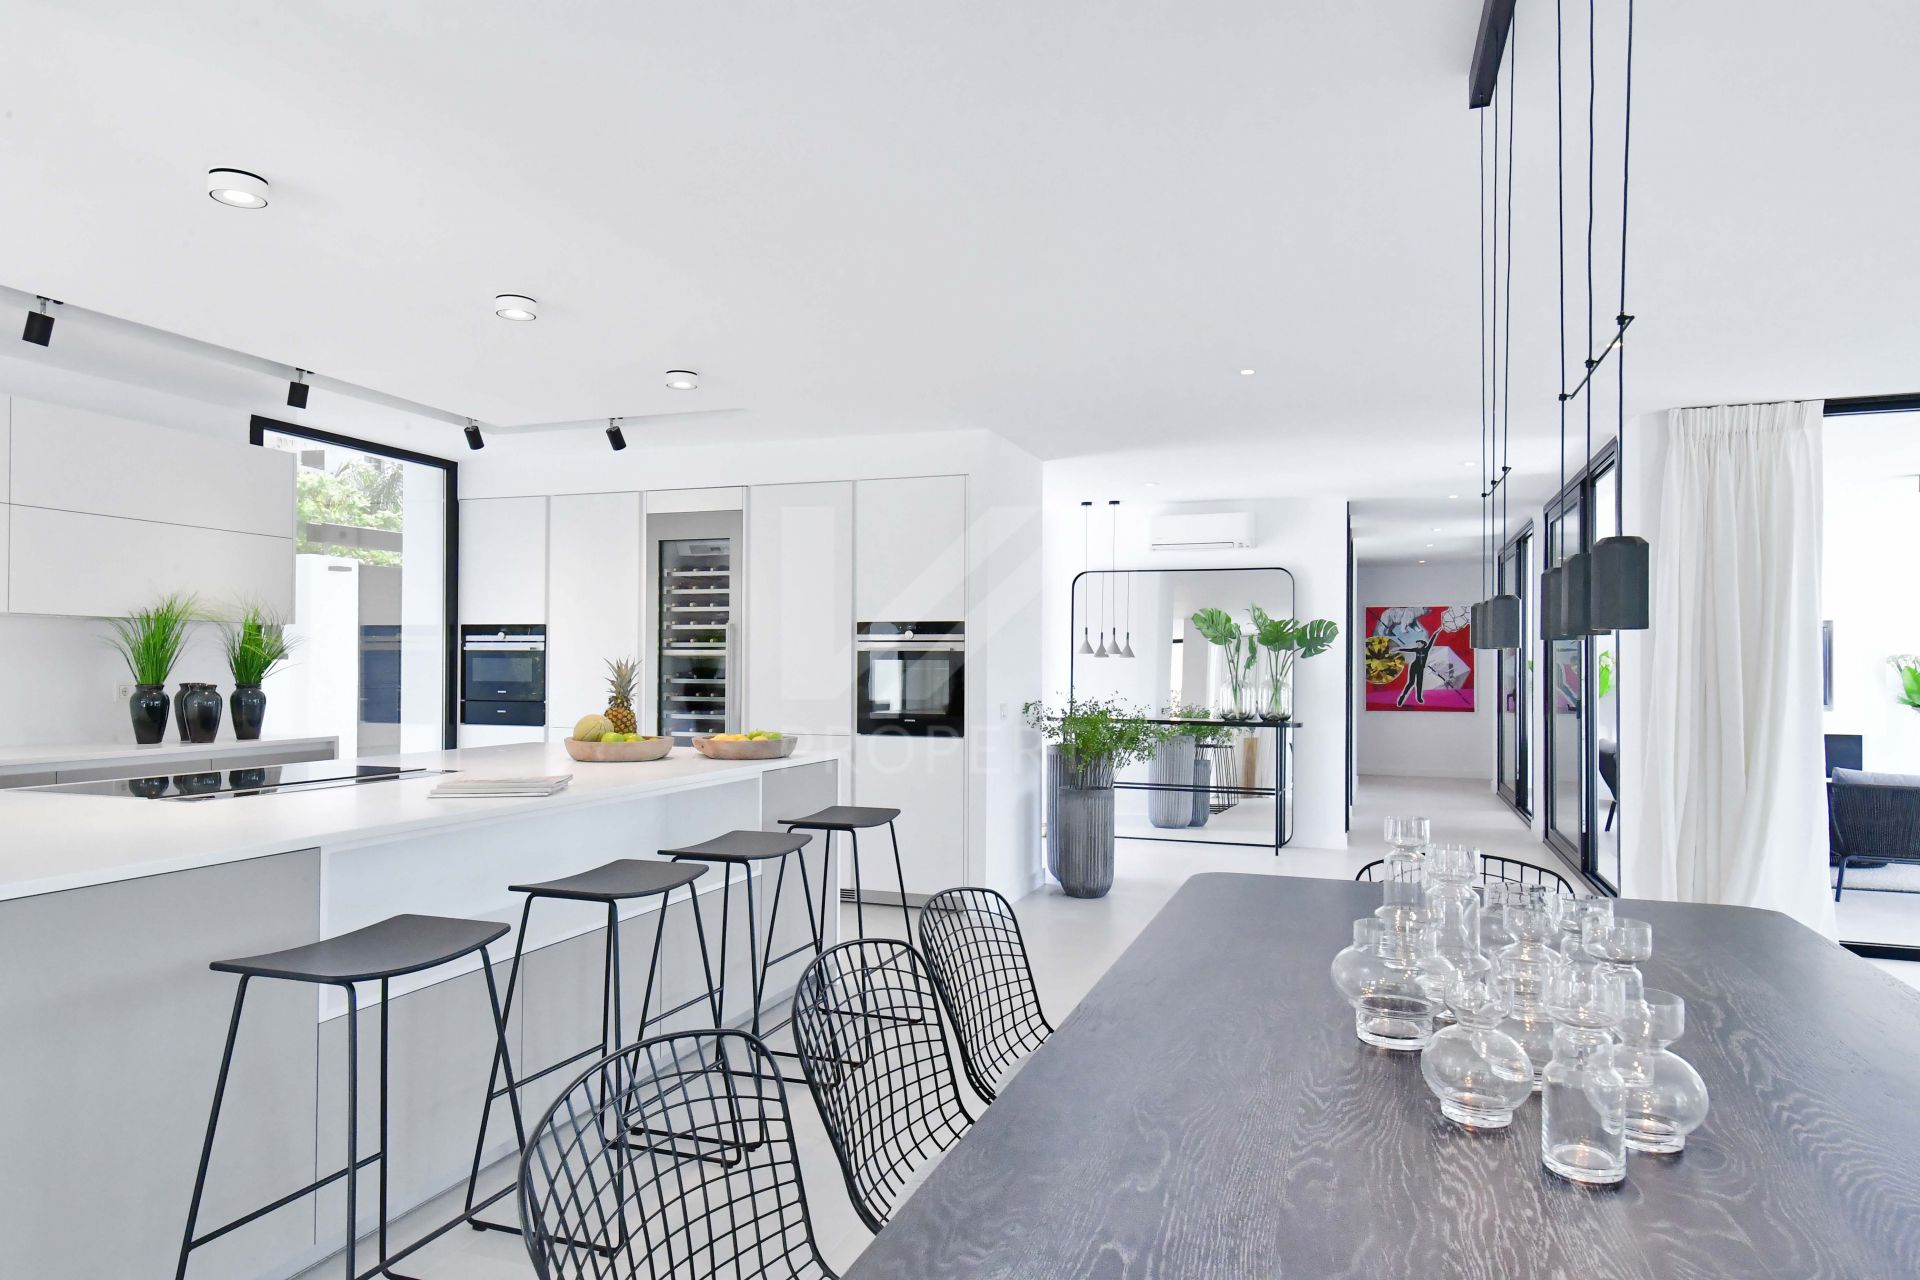 ultra modern villa with scandinavian interior design in the heart of rh vaproperty es